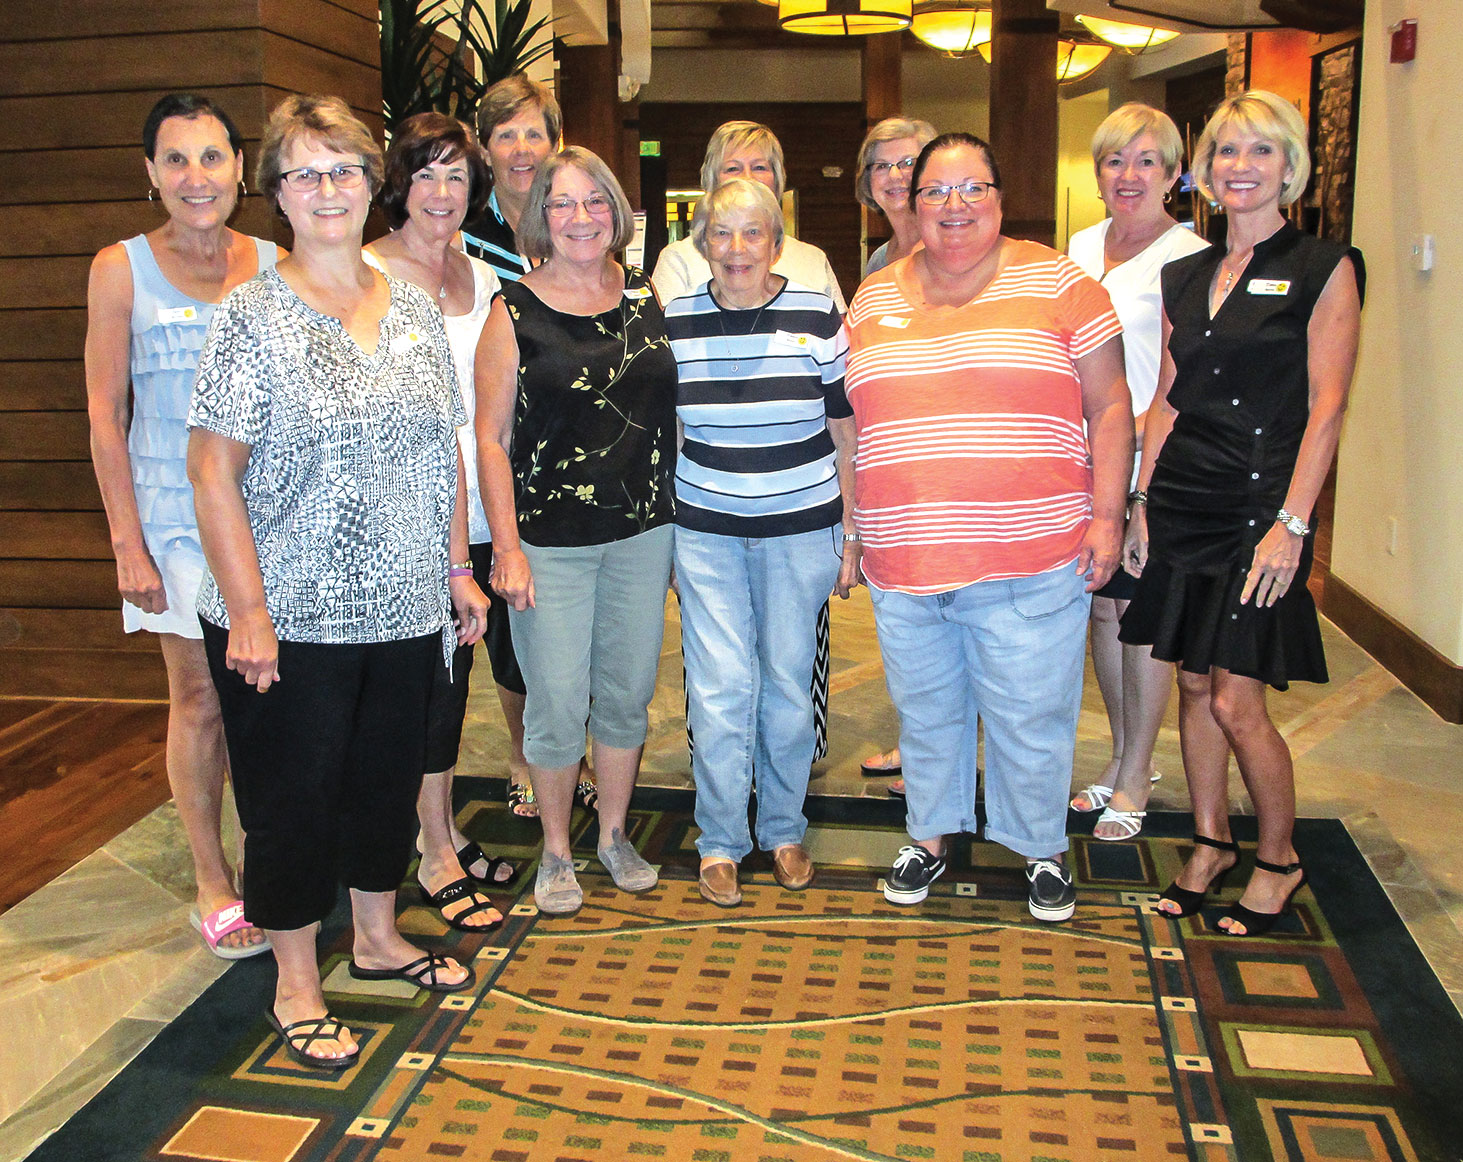 New members of the SBR Women's Club